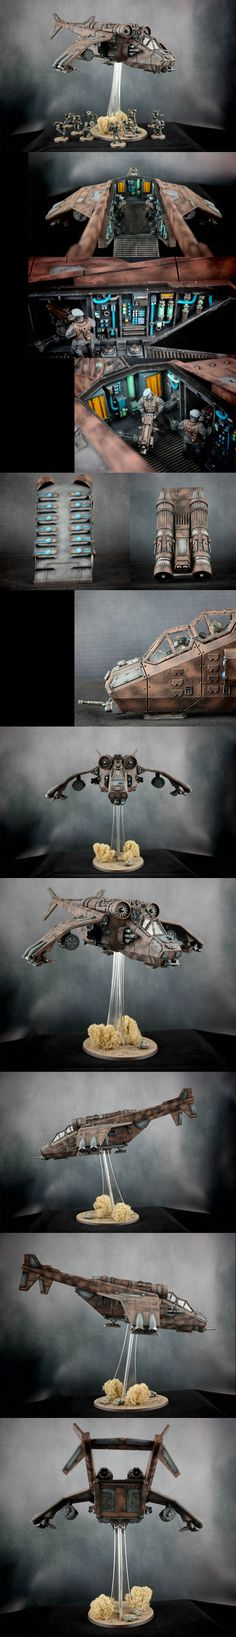 Astra Militarum, Militarum Tempestus, Imperial Navy - Valkyrie      Regiment: Lions of Leander VI      Warhammer 40k